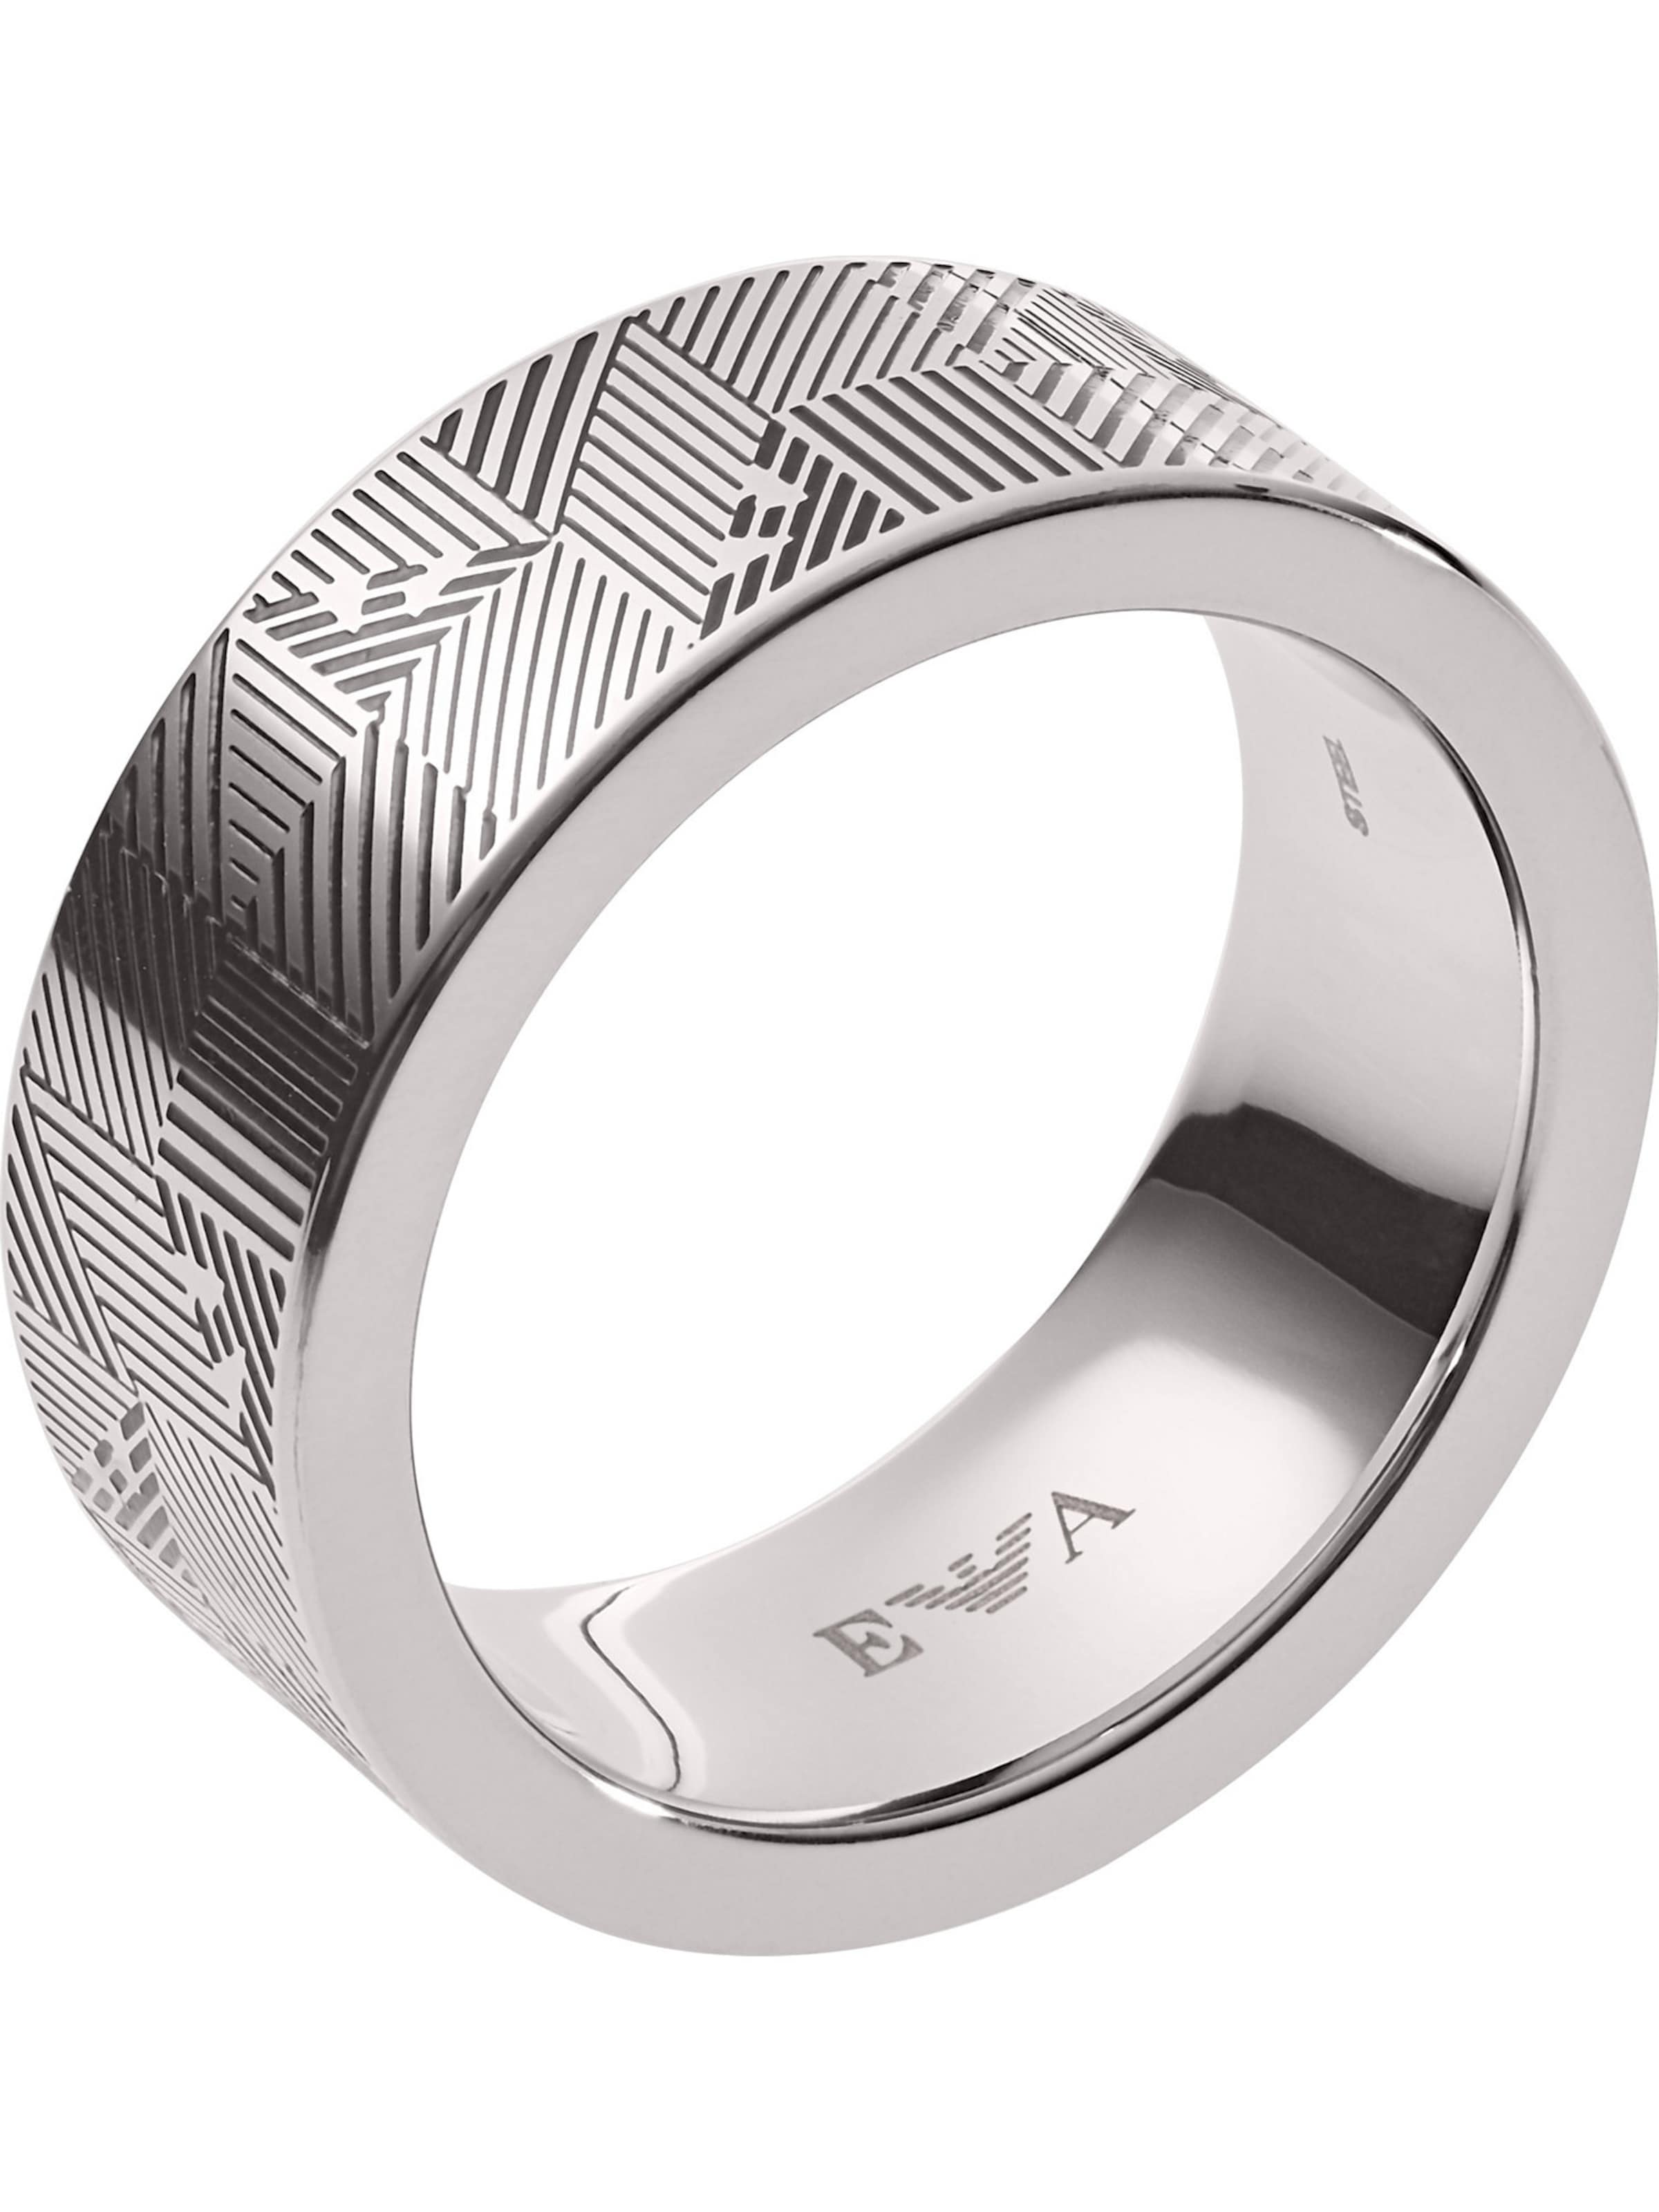 Ring Armani 'egs2508040' SchwarzSilber Emporio In rdtsxQhC